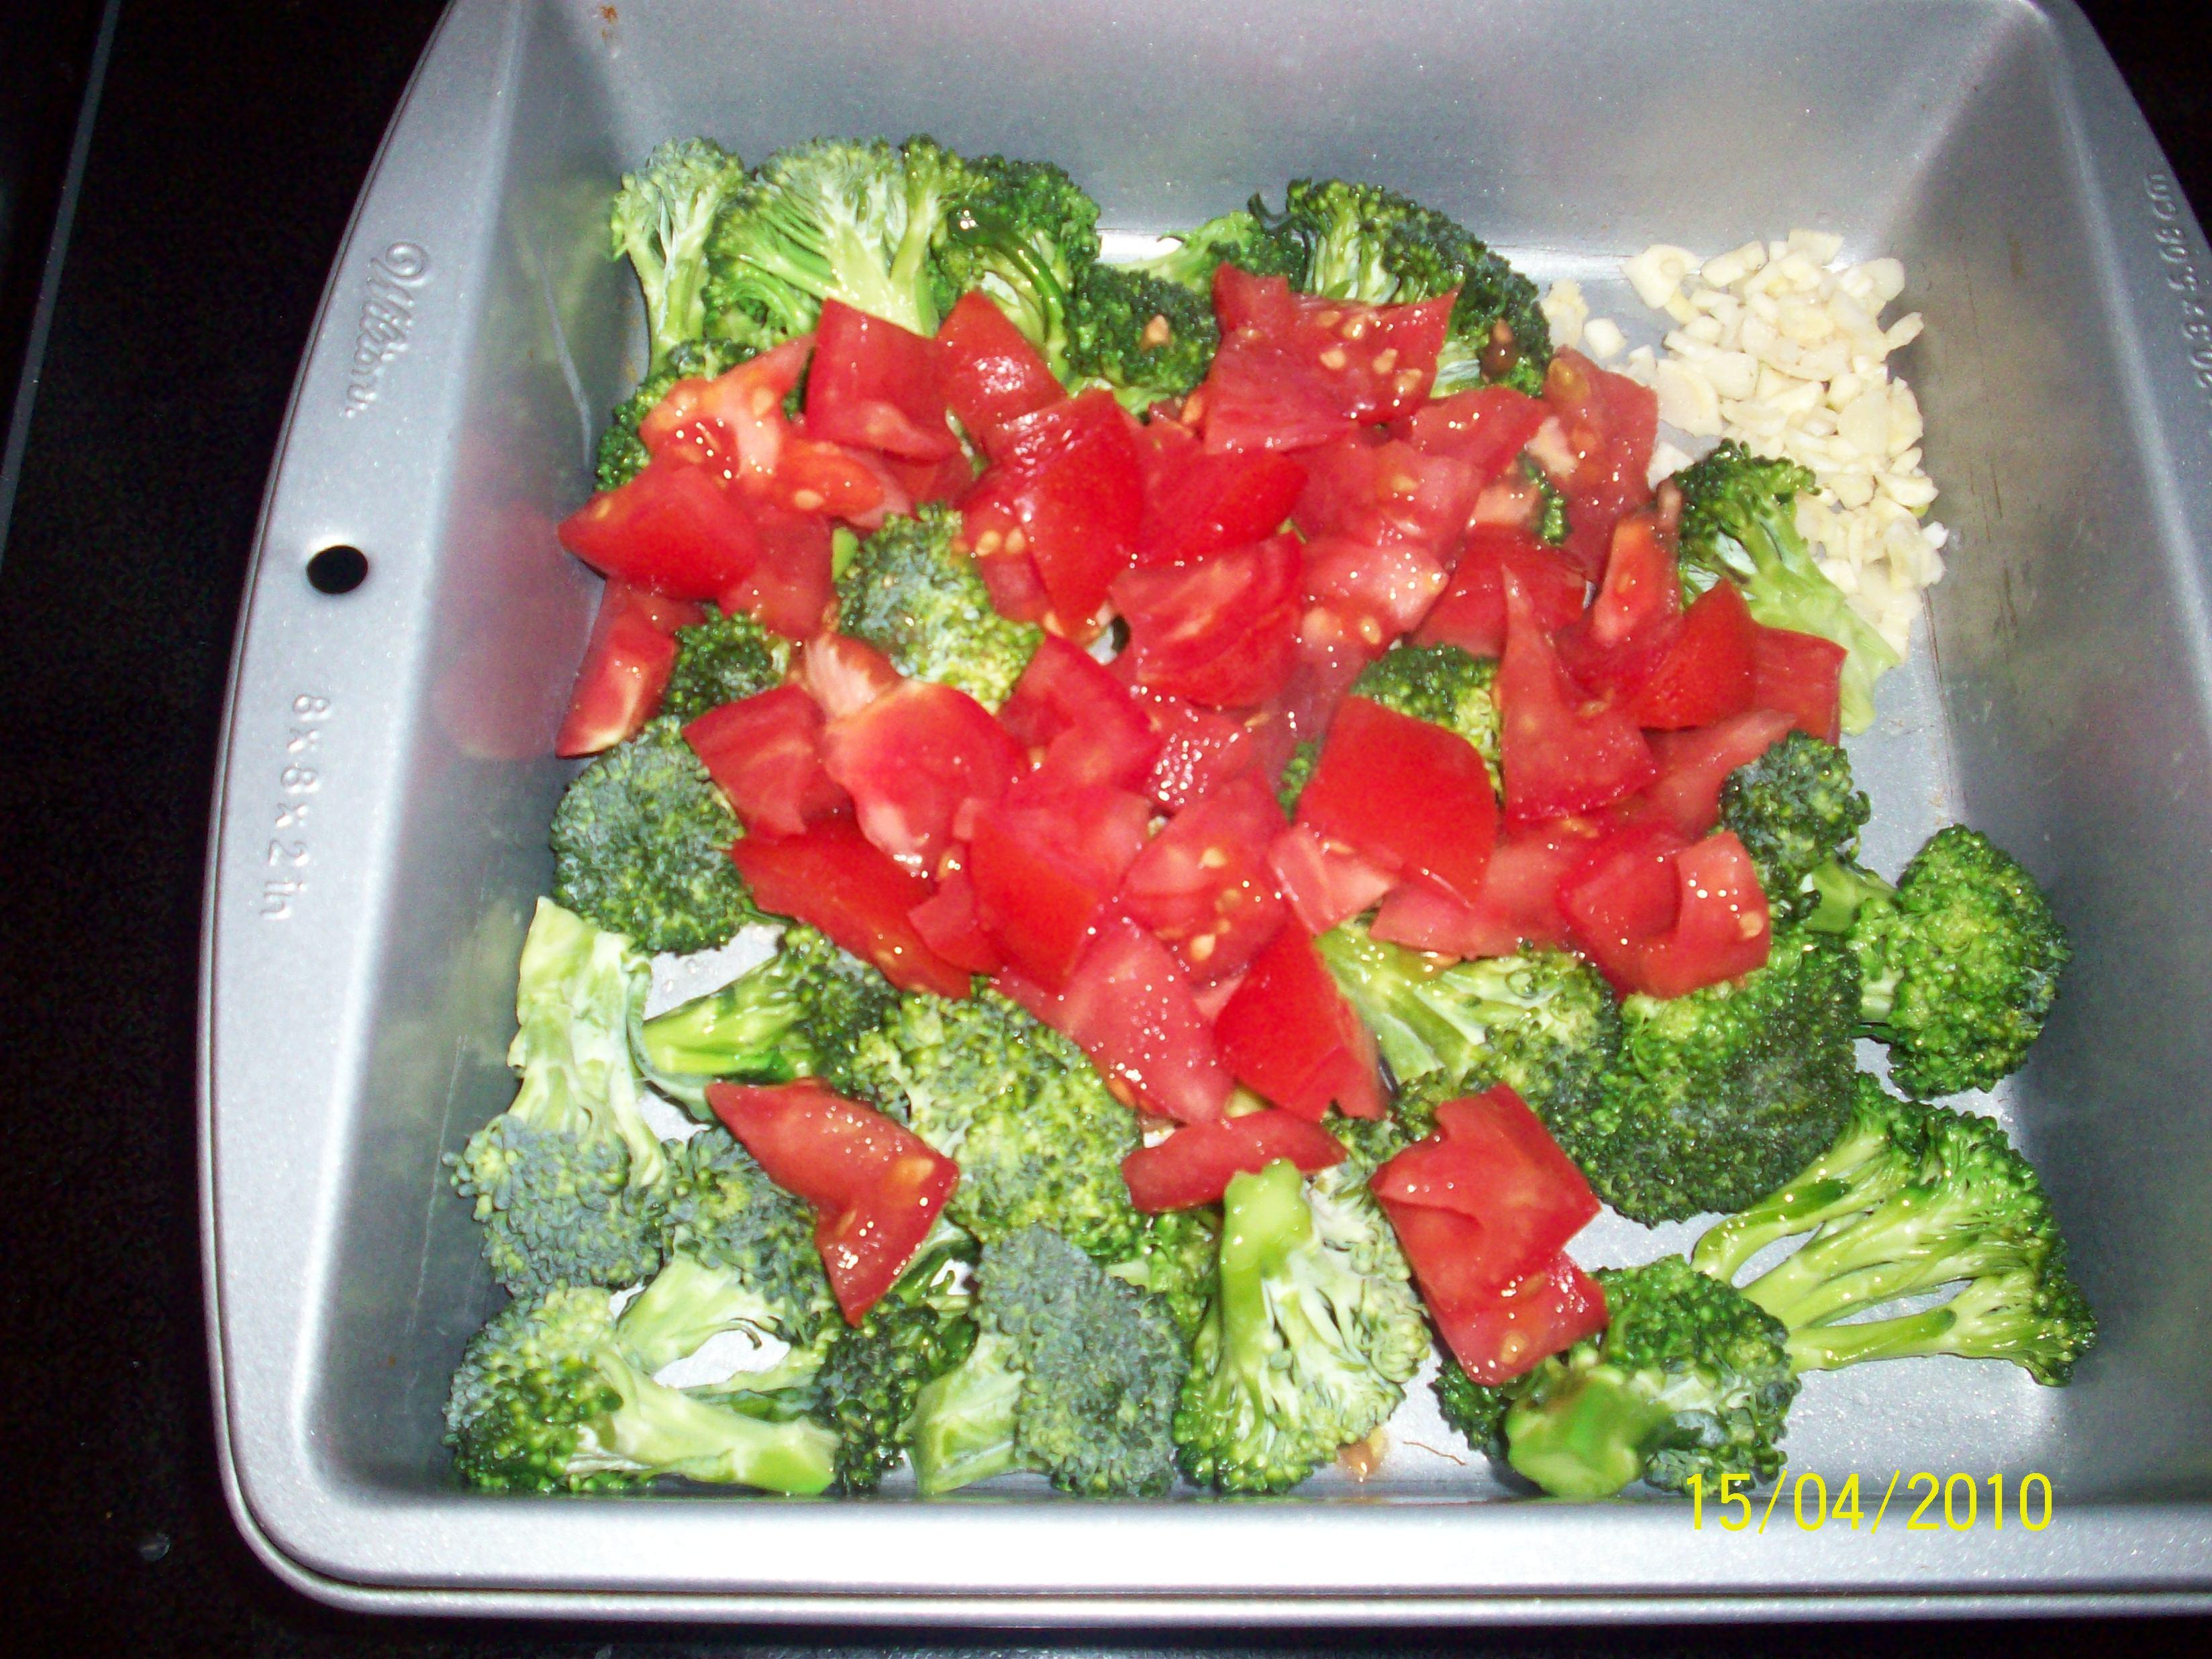 https://foodloader.net/cutie_2010-04-15_Tortellini_with_Roasted_Cauliflower_and_Tomatoes3.jpg